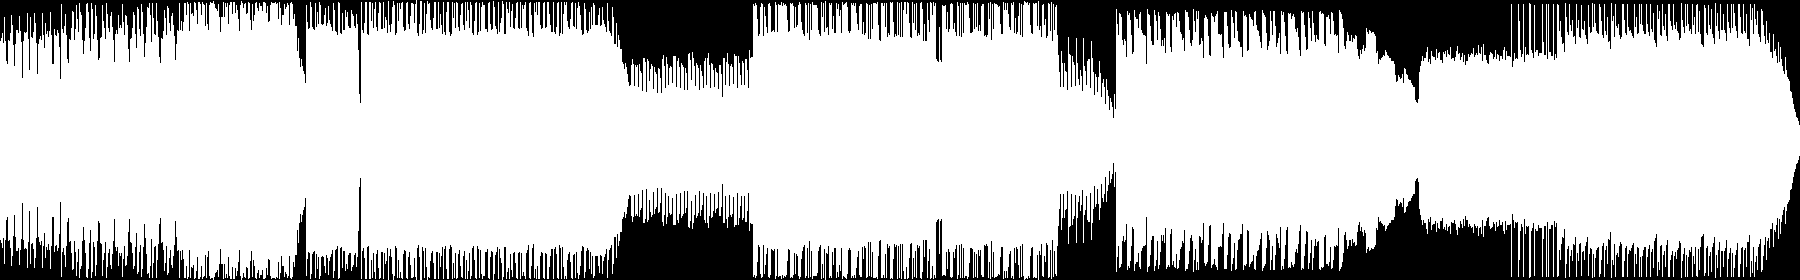 North audio waveform